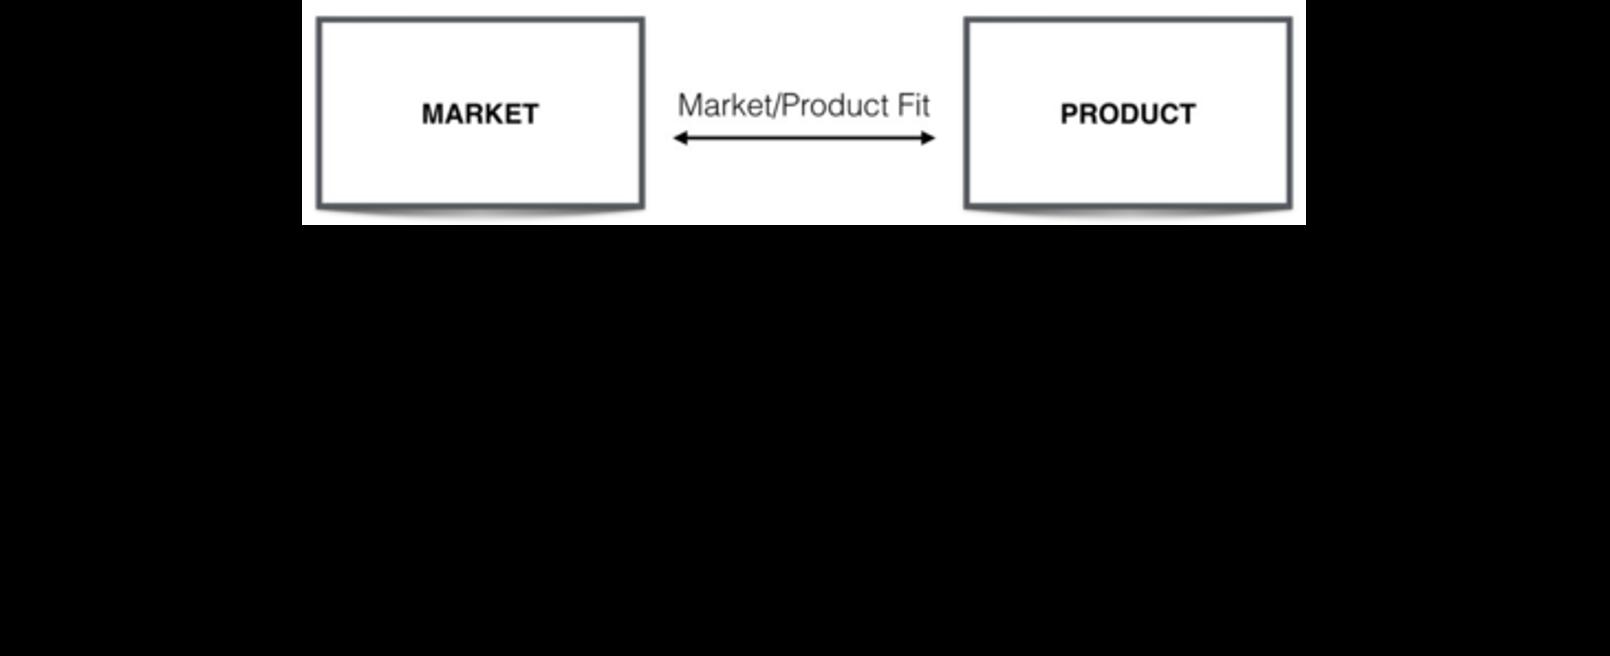 Market/Product Fit